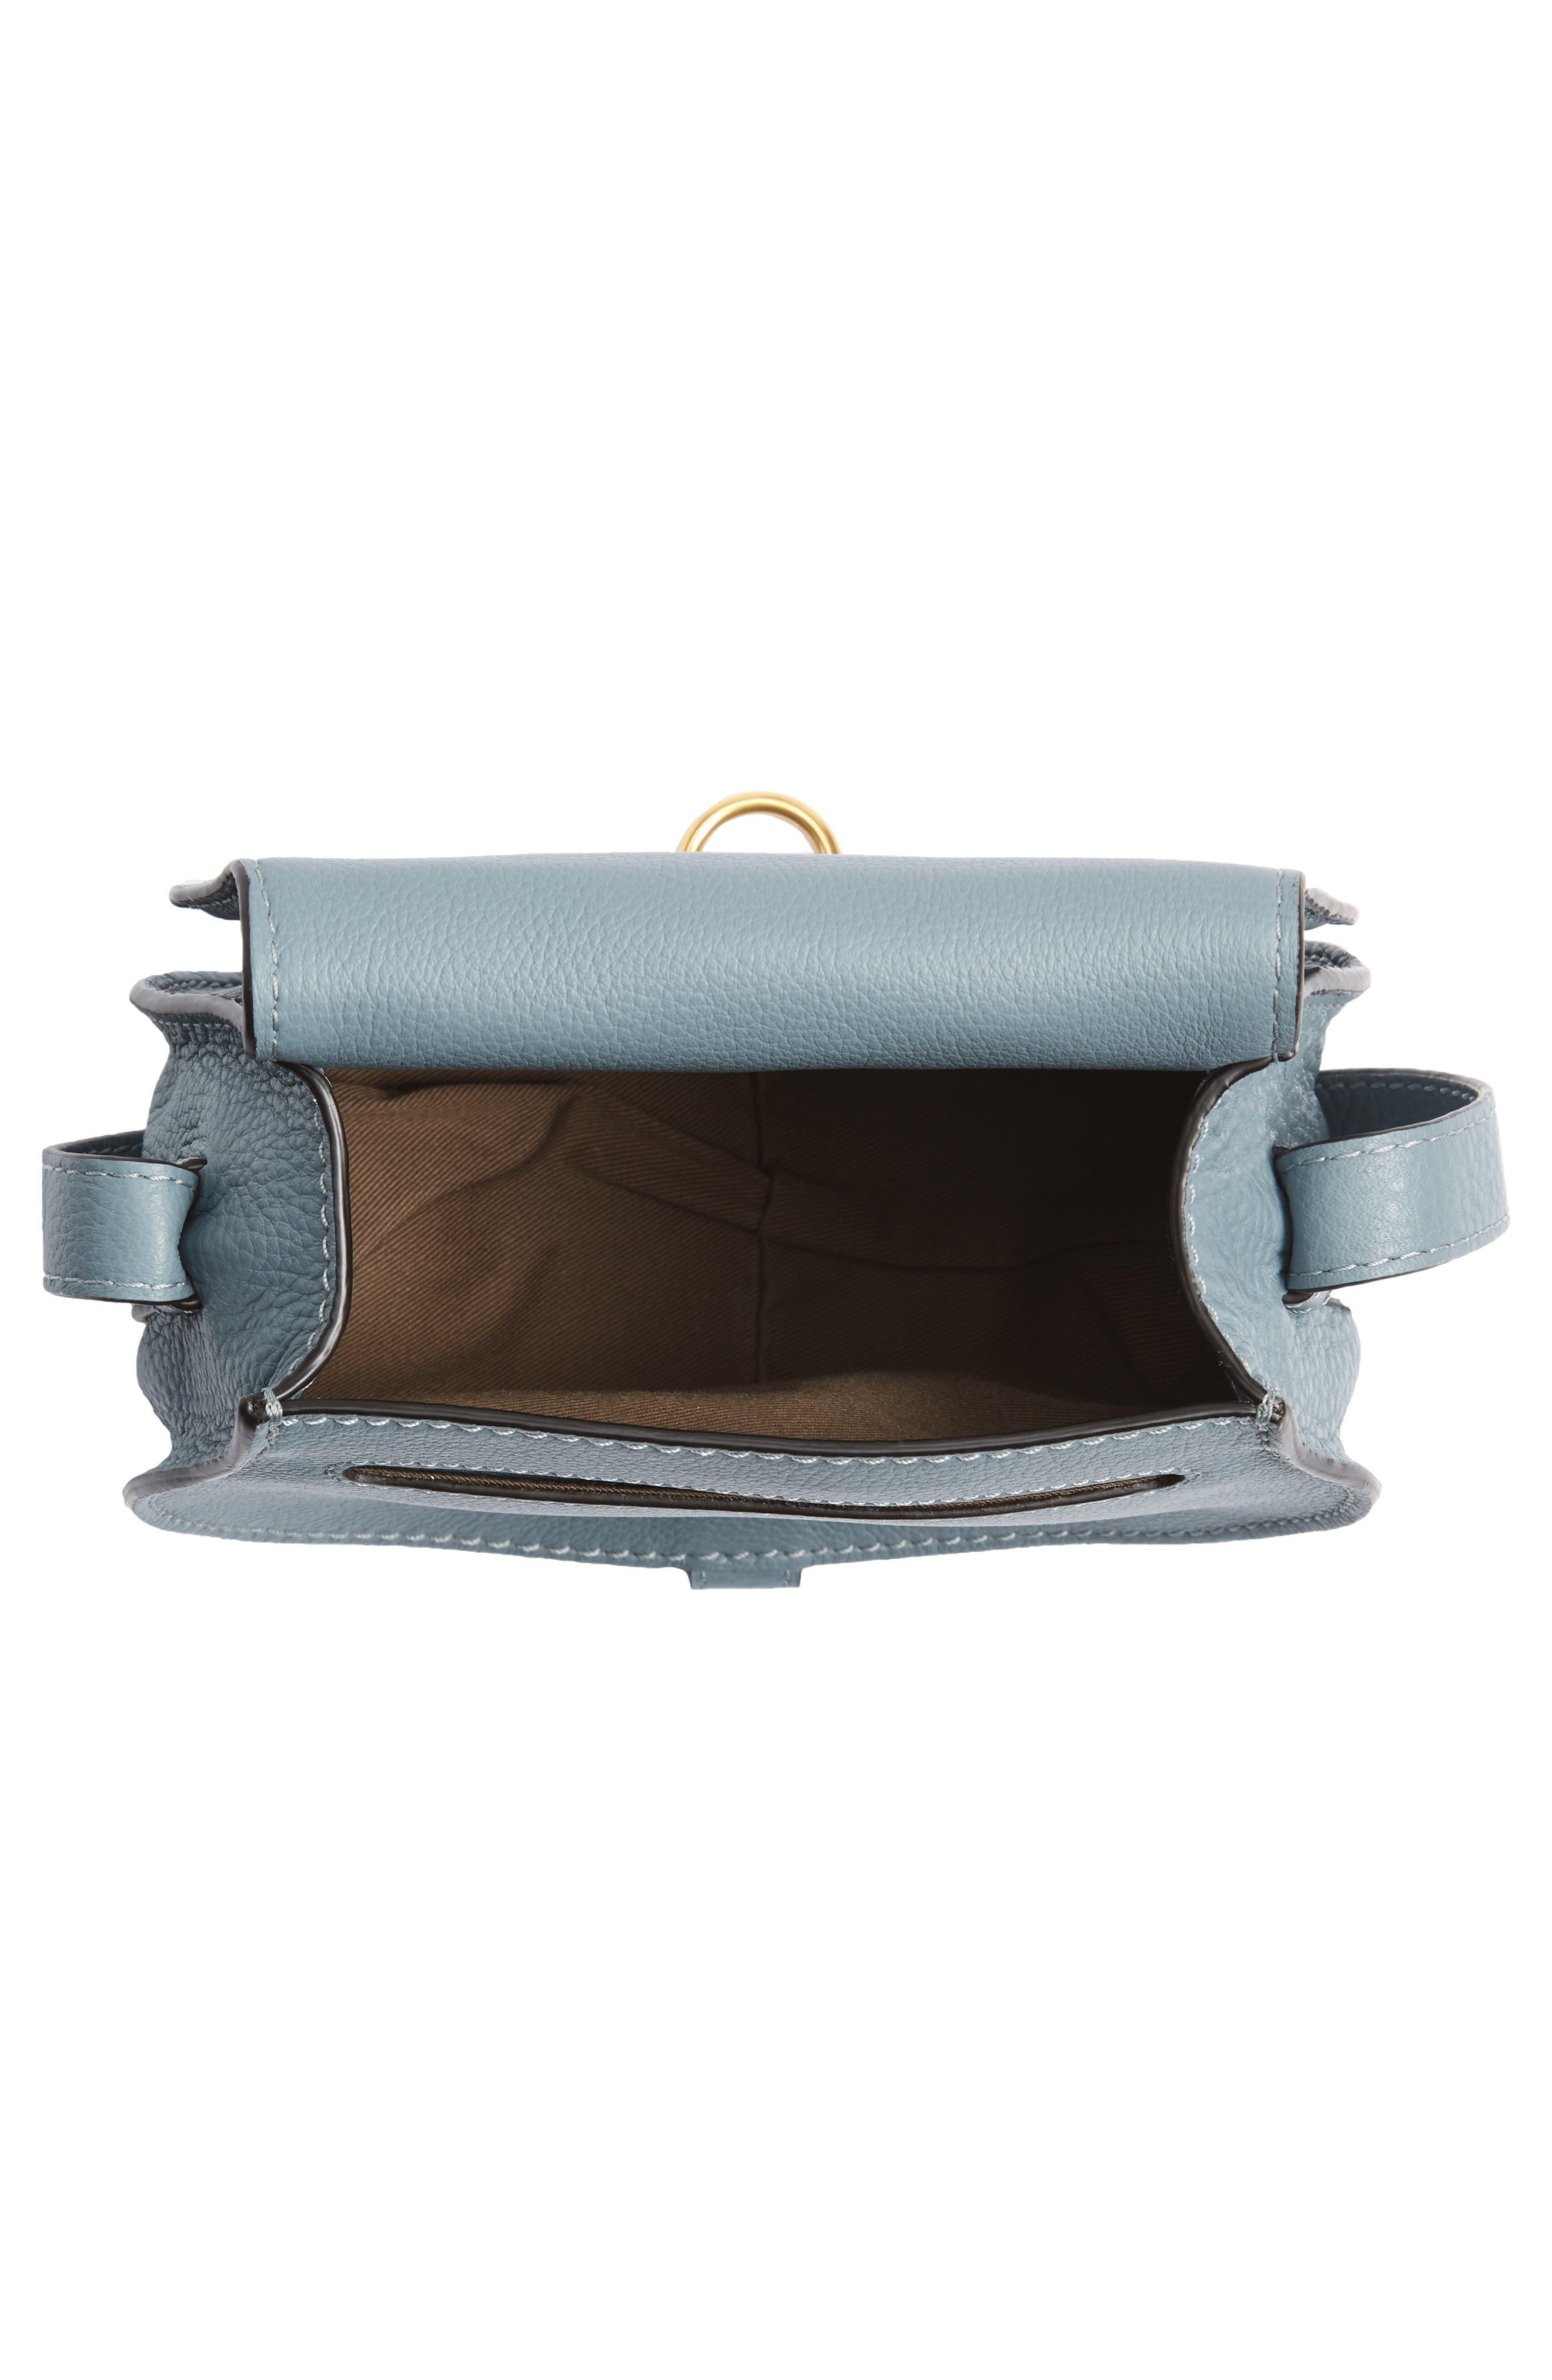 'Mini Marcie' Leather Crossbody Bag,                             Alternate thumbnail 4, color,                             BFC CLOUDY BLUE